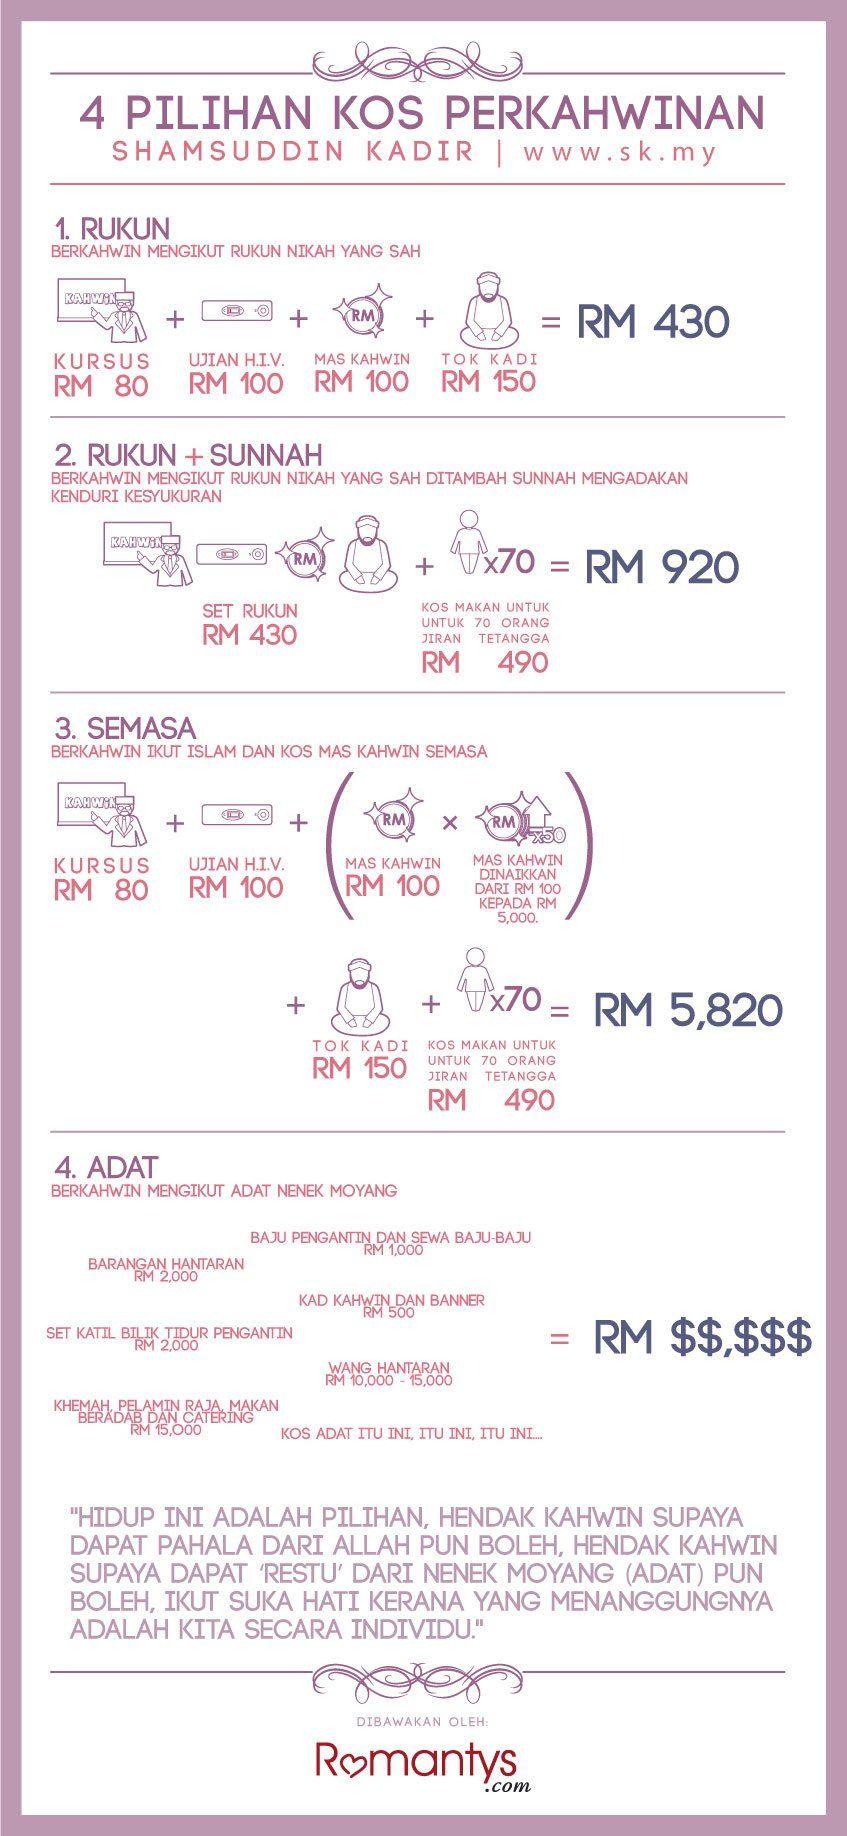 Marriage Expenses Wedding Infographic Wedding Preparation Checklist Wedding Planner Guide